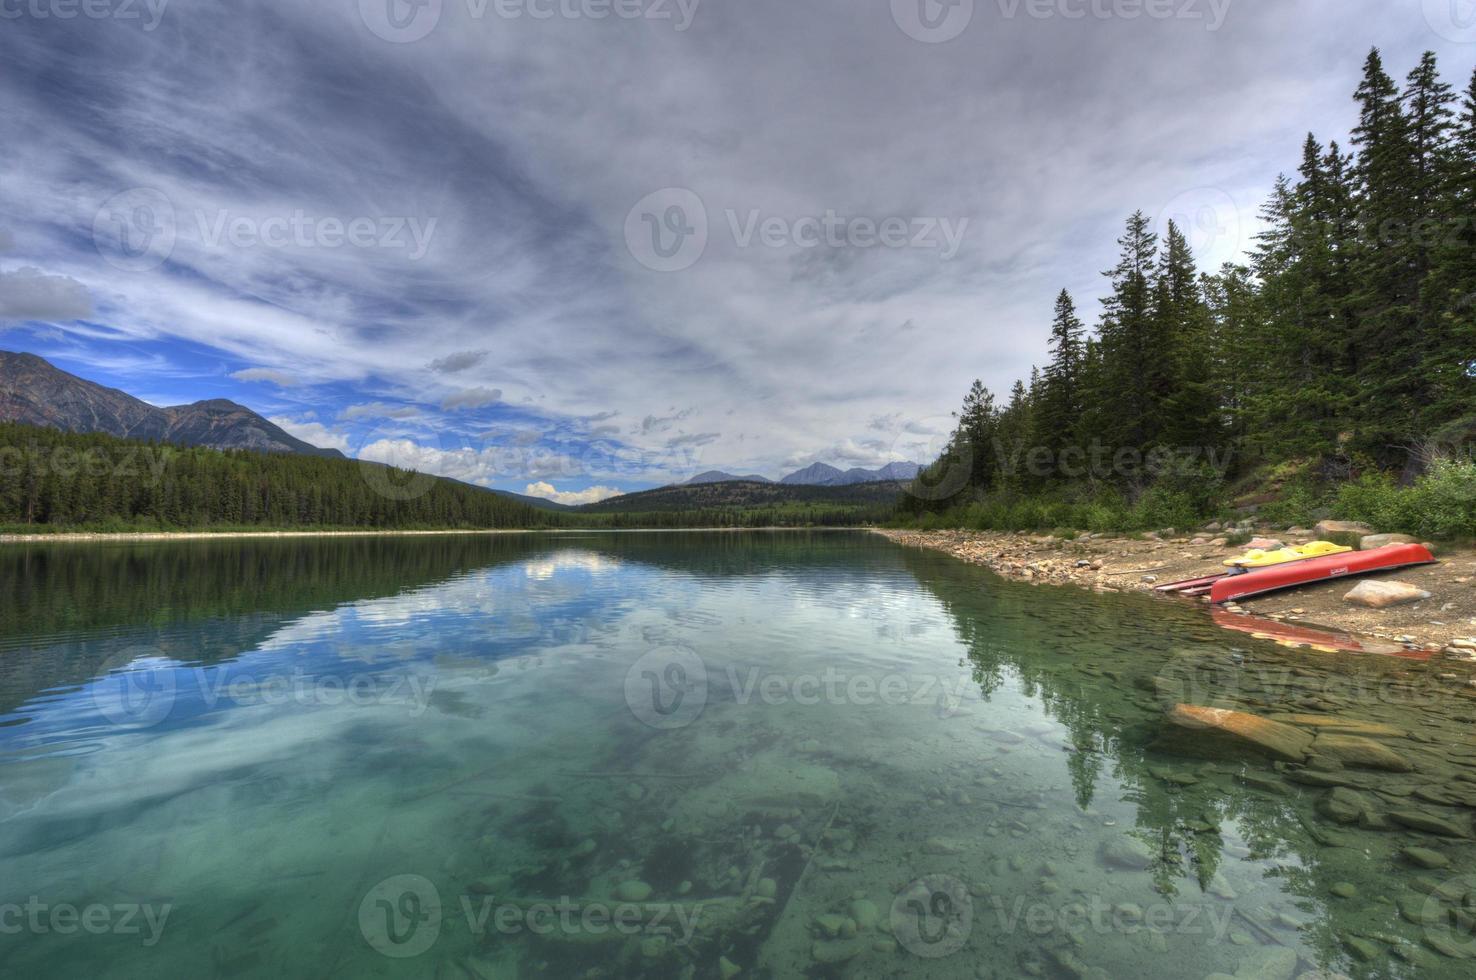 montanhas rochosas, colúmbia britânica, canadá. foto